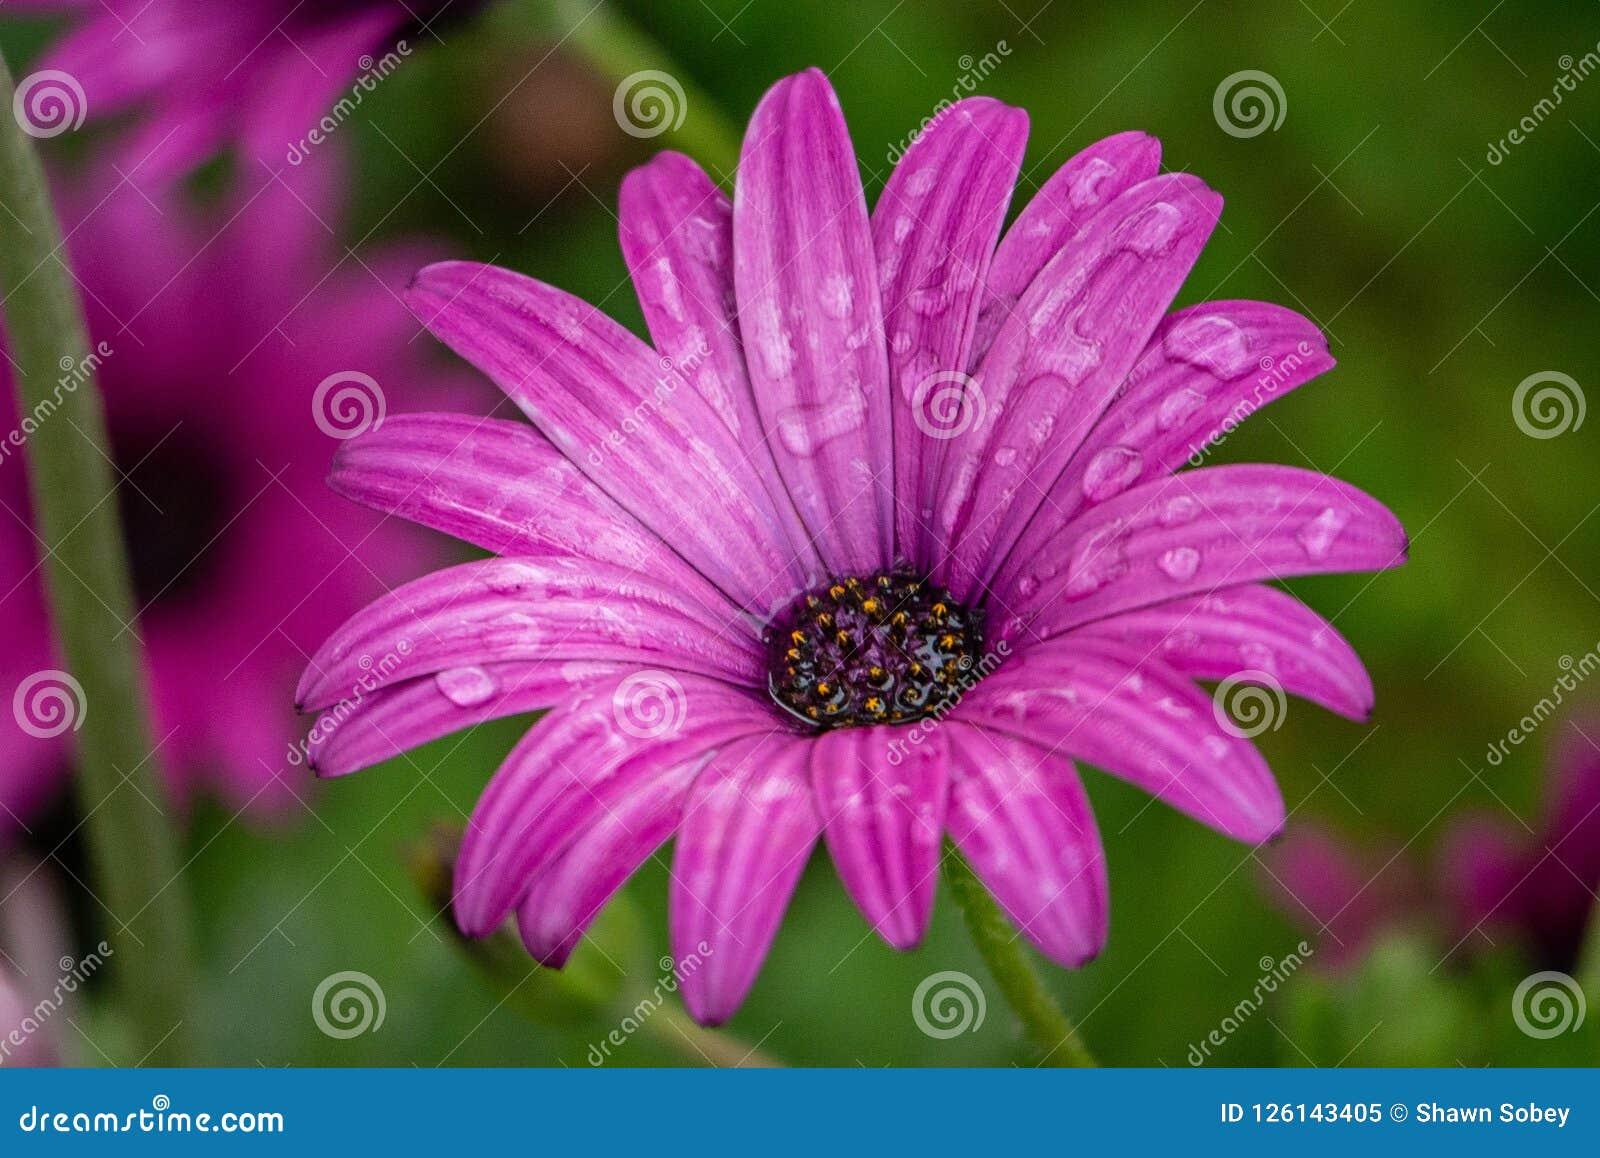 A Pink/purple daisy after rain